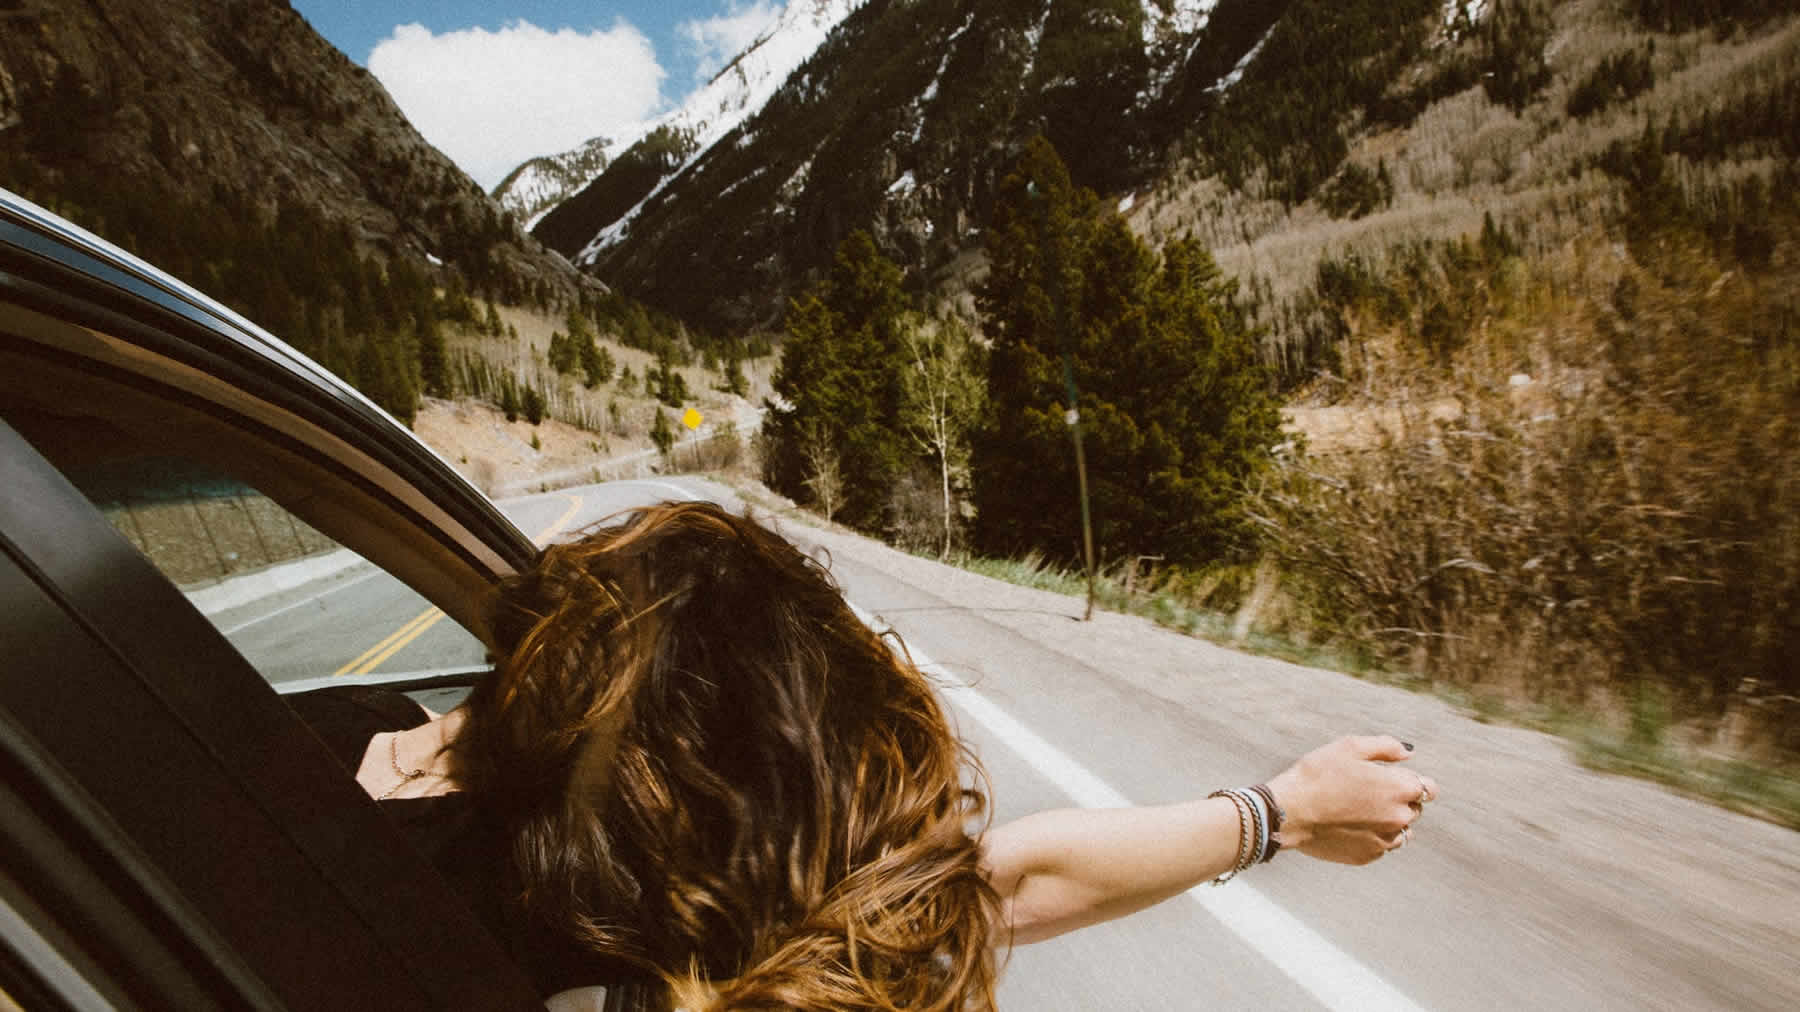 https://www.travelandleisure.com/trip-ideas/road-trips/how-to-have-the-perfect-road-trip-monique-harrison